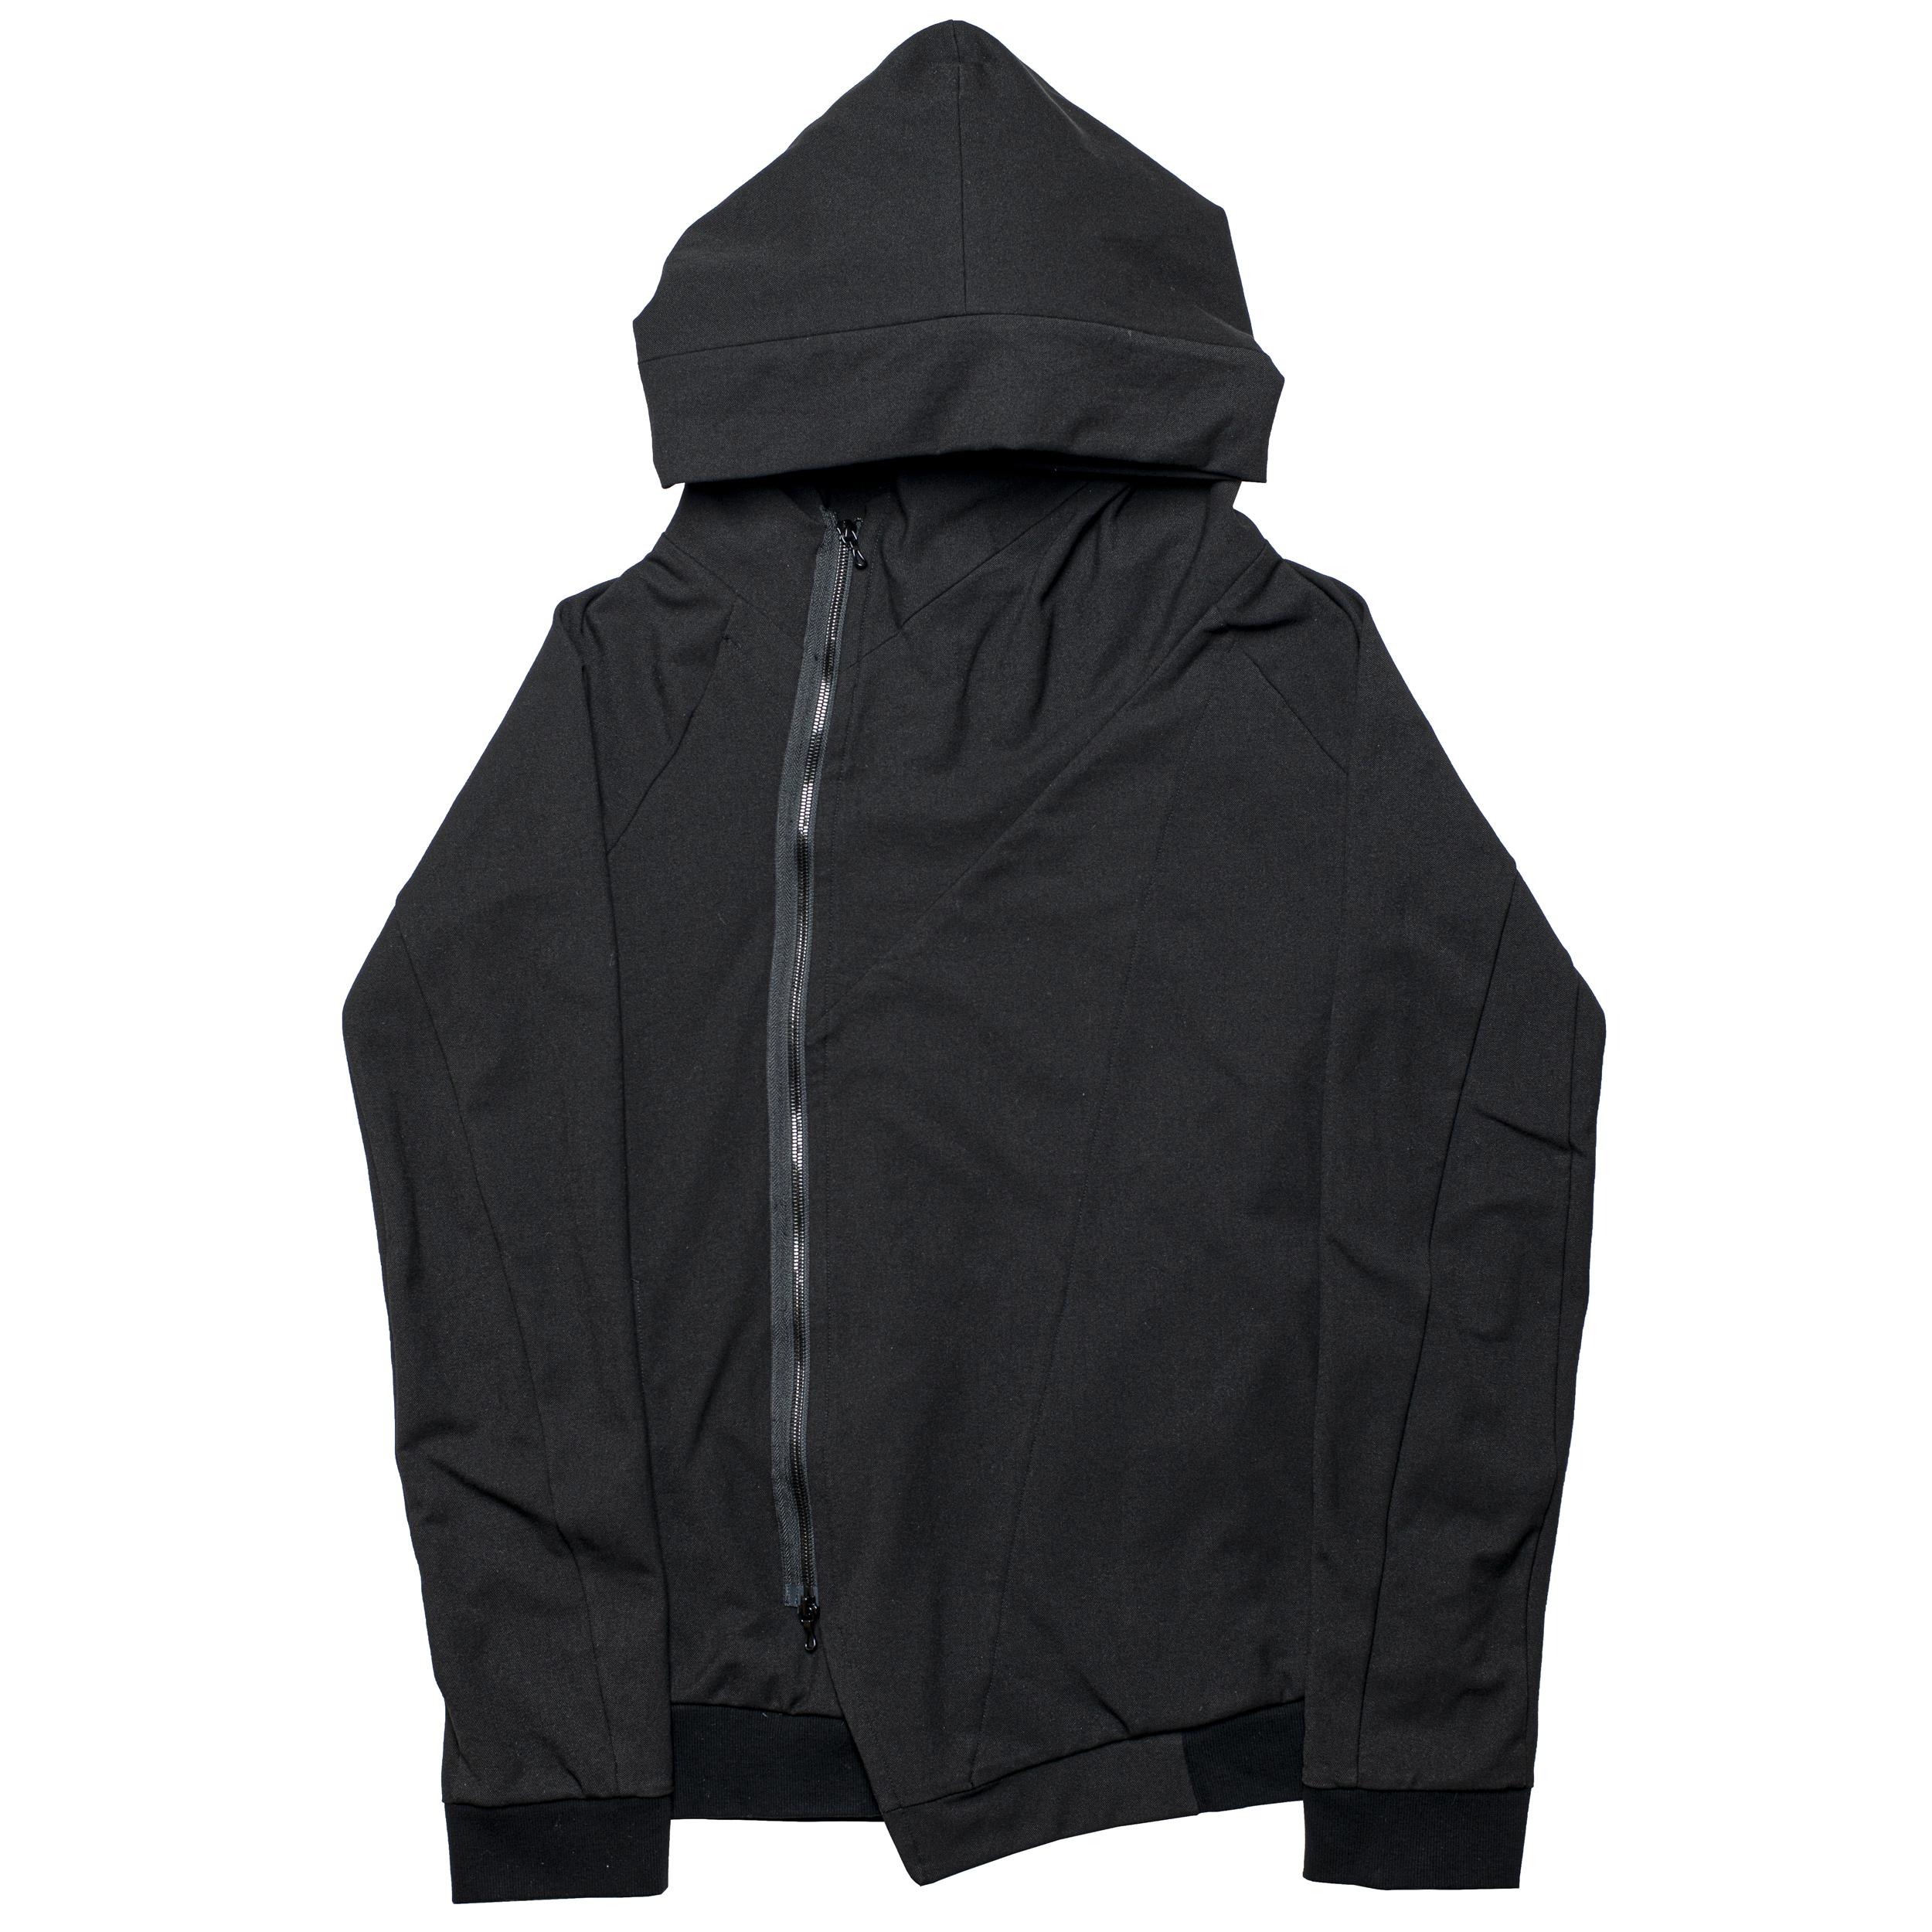 678BLM1-BLACK / ジオメトリックフーデットジャケット